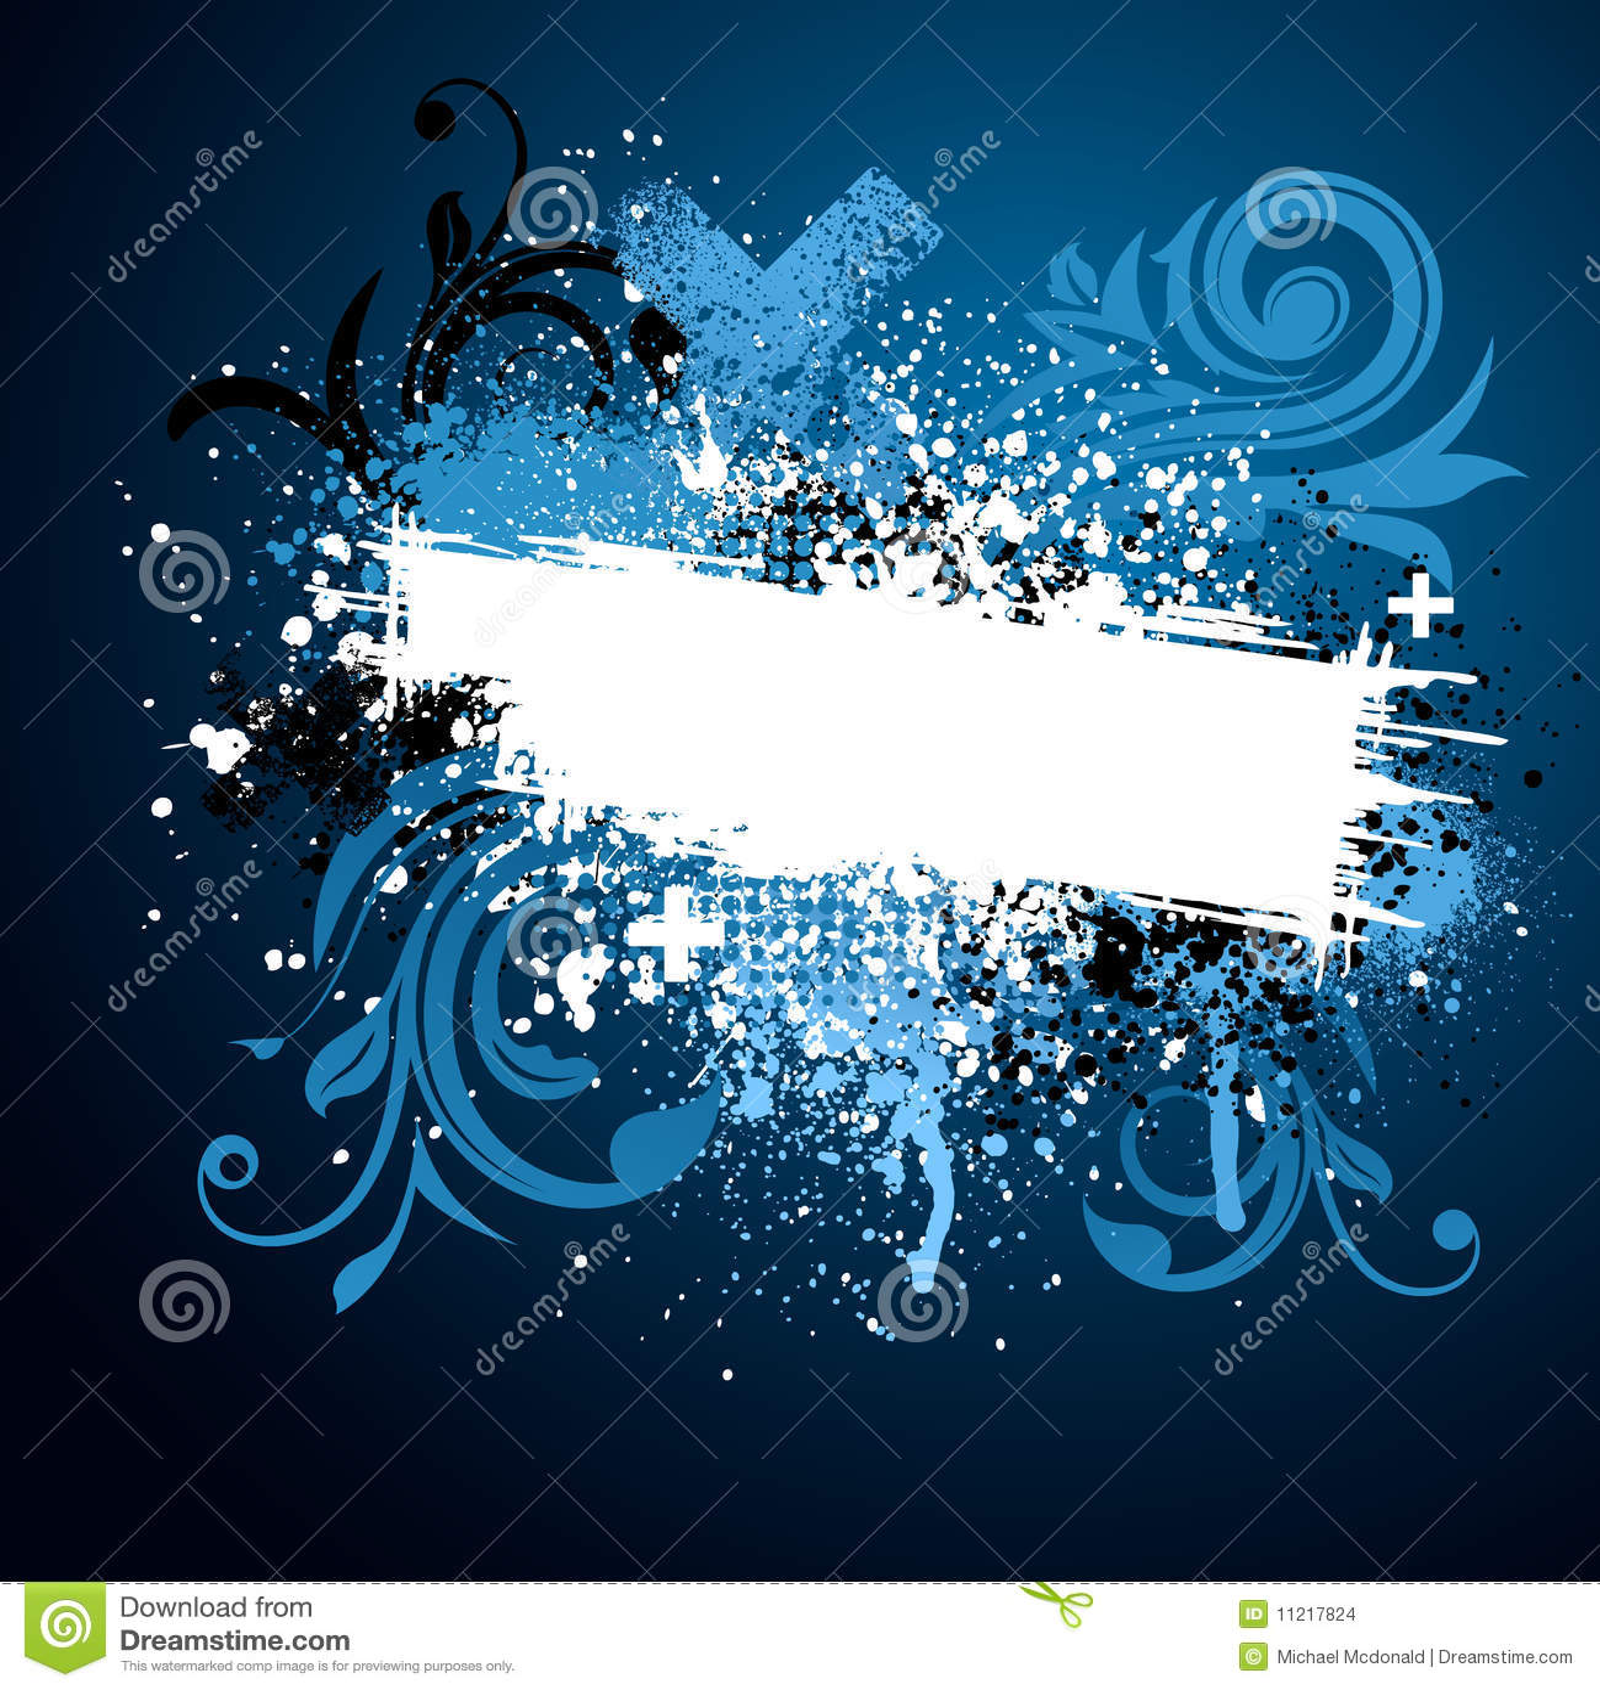 Black And Blue Floral Paint Splatter Stock Images - Image ...